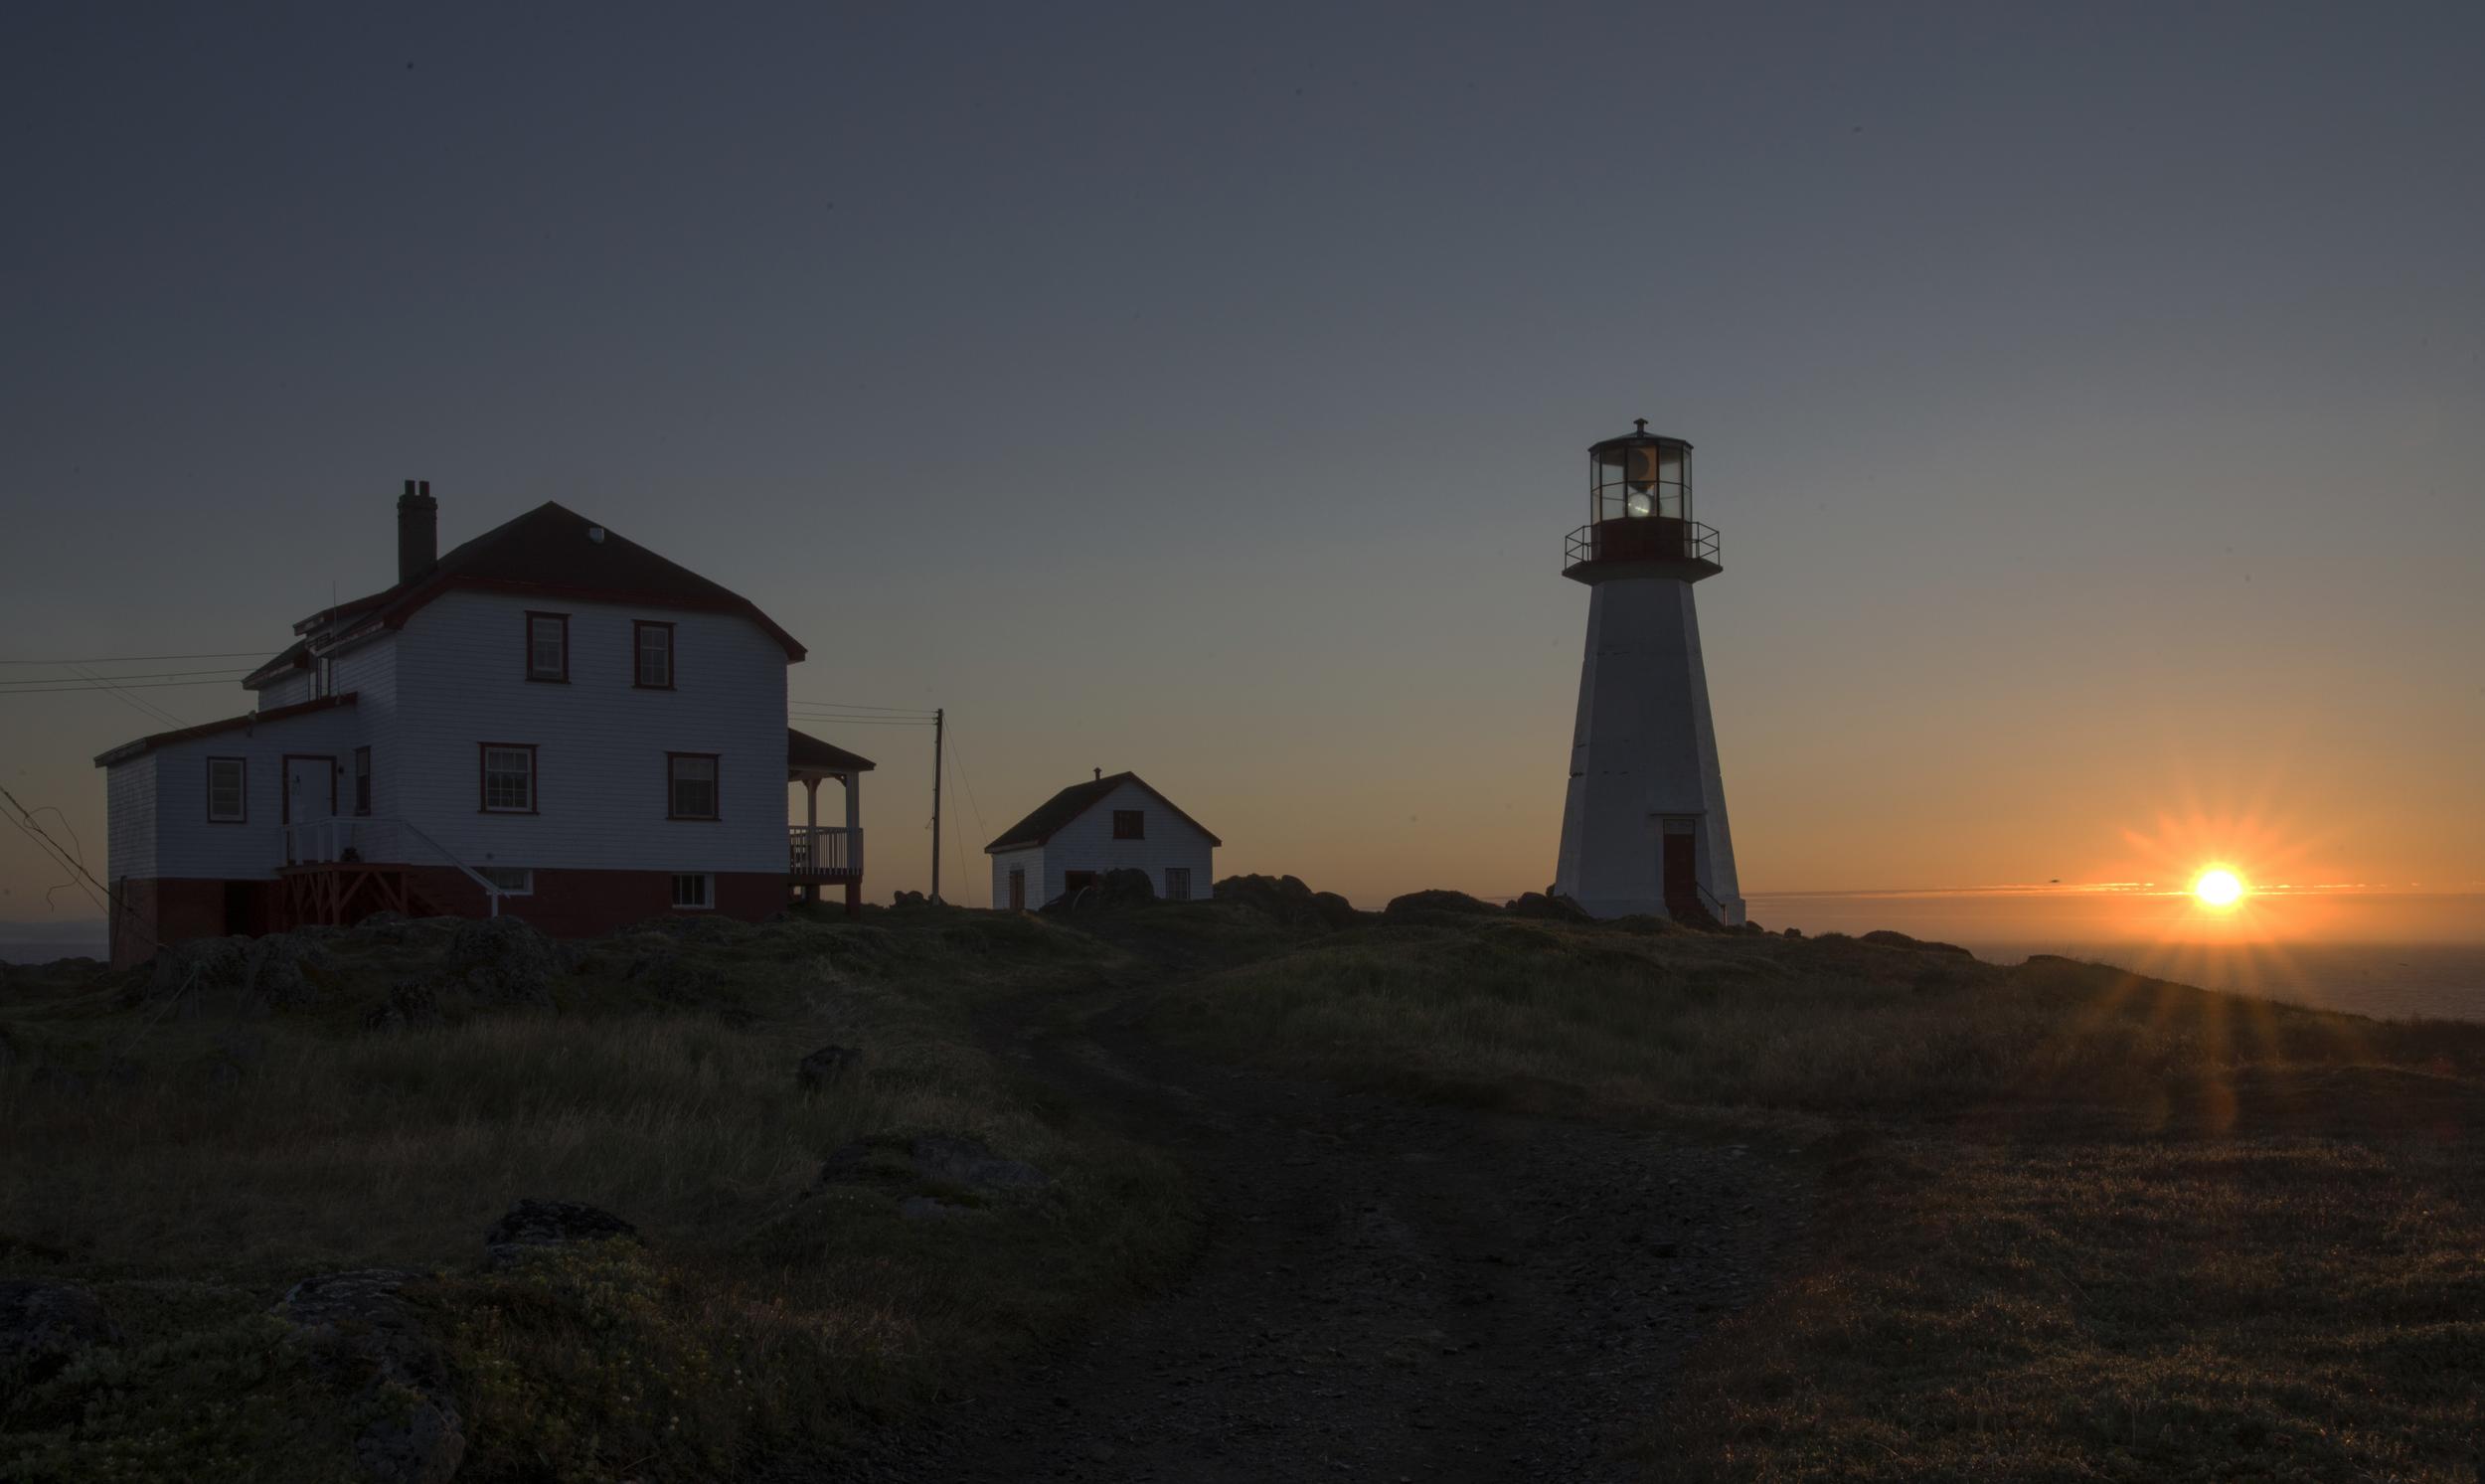 sunrise at quirpon island.jpg